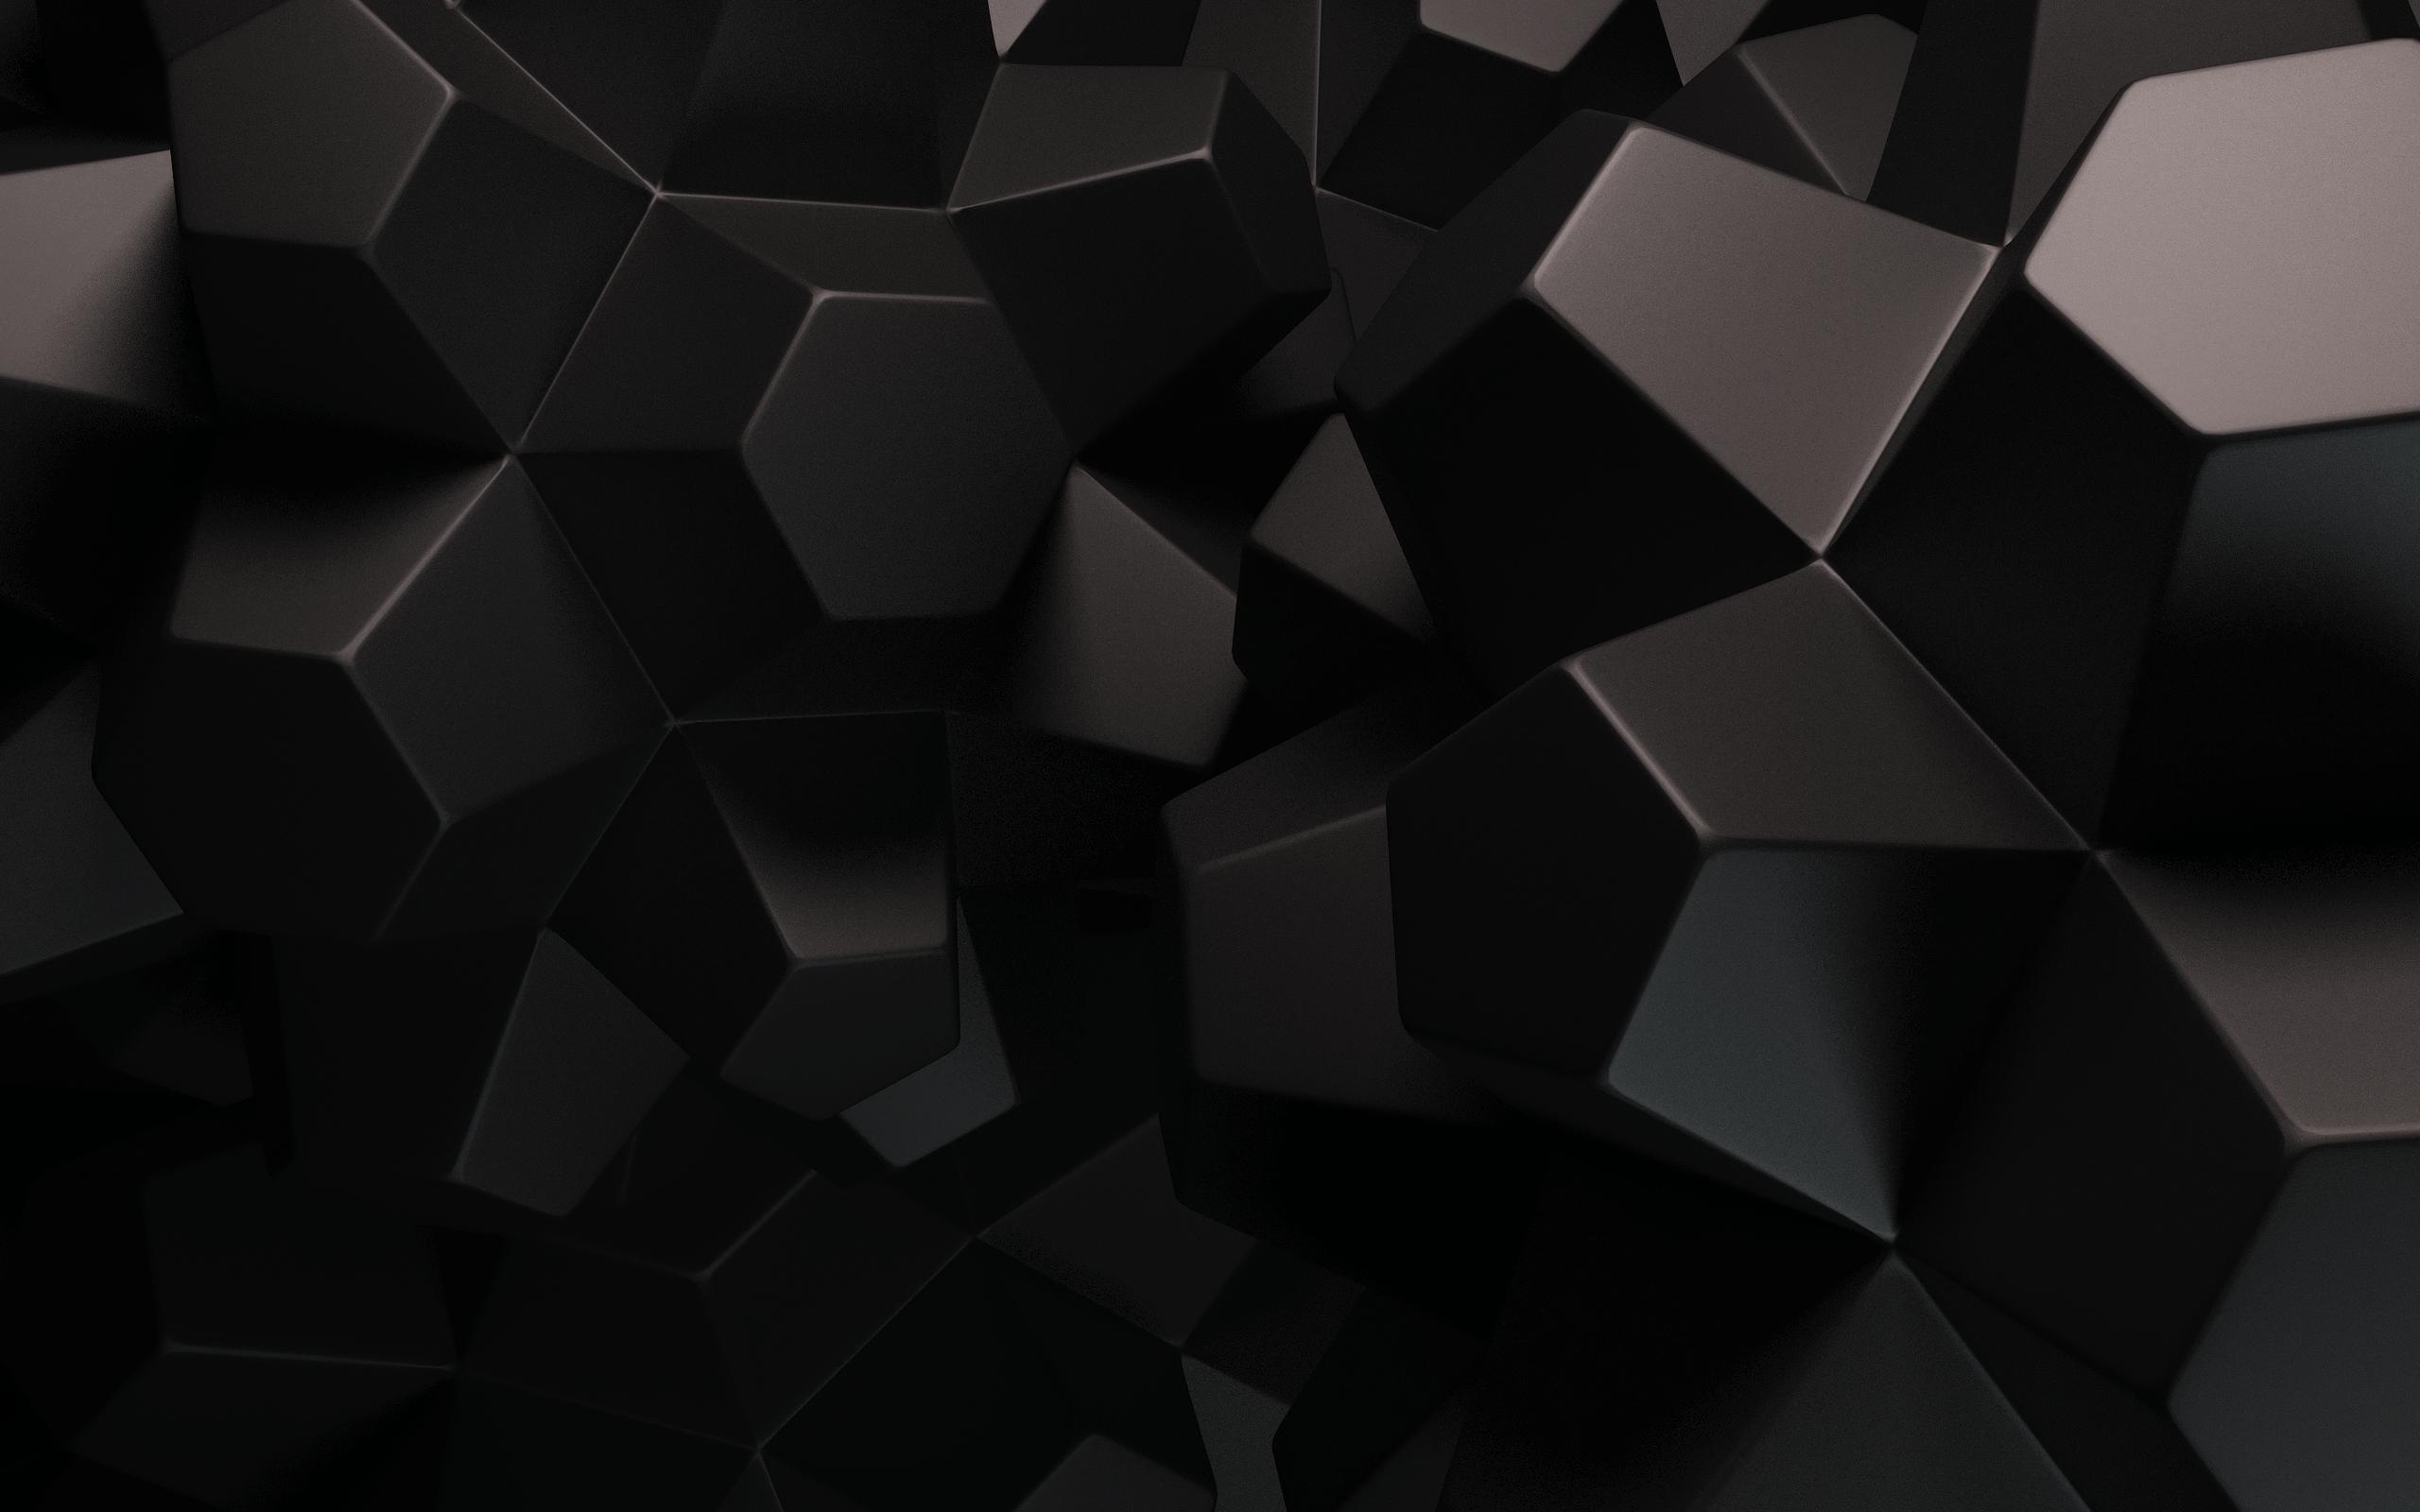 Abstract Black Dark Square Wallpaper Abstract Black Dark Square Wallpaper 3d Download Free Hd Black Background Wallpaper Black Hd Wallpaper Abstract Wallpaper